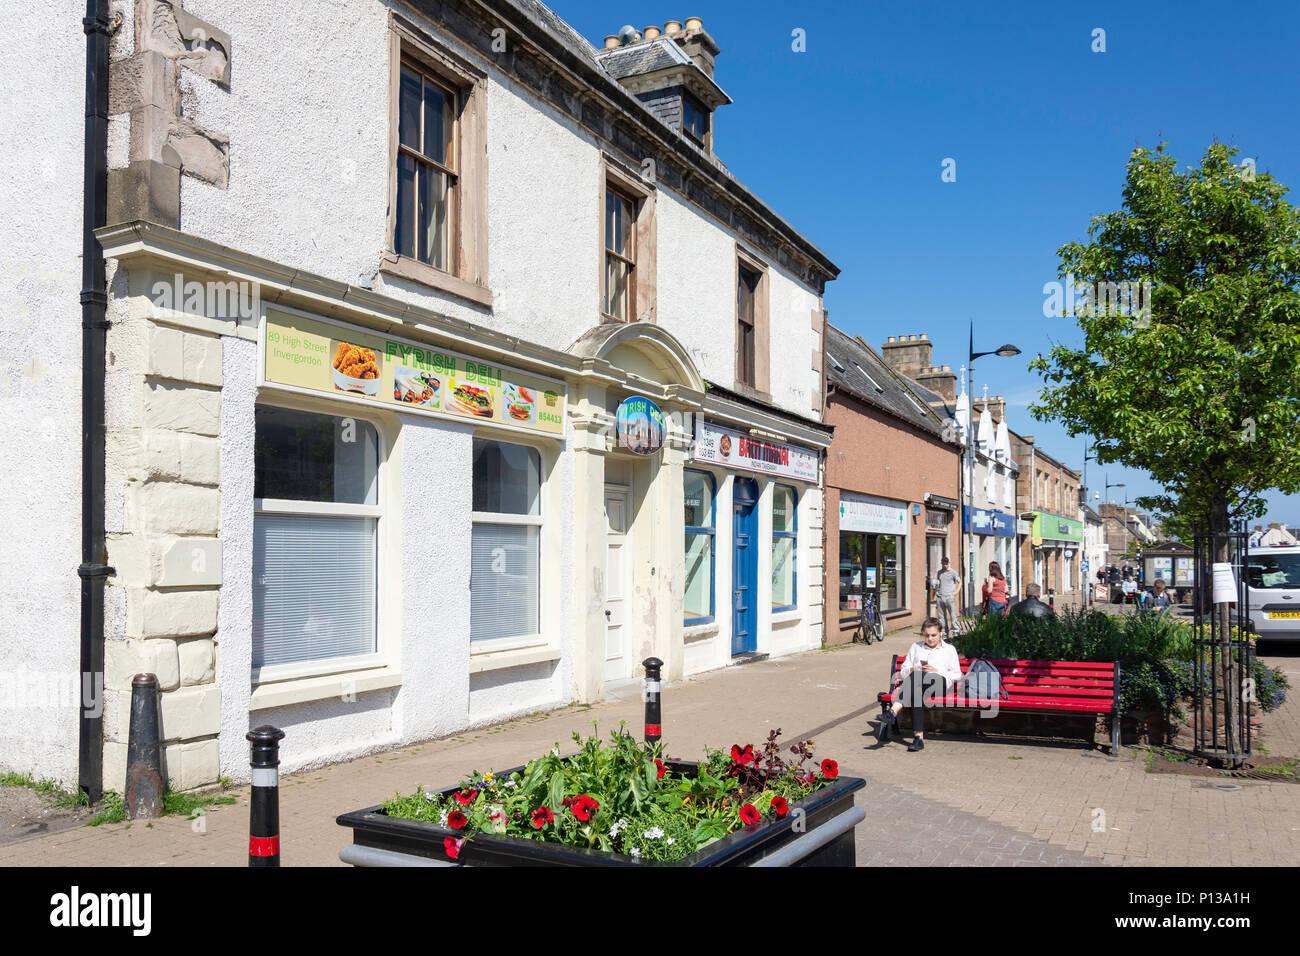 High Street, Invergordon, Highland, Scotland, United Kingdom - Stock Image